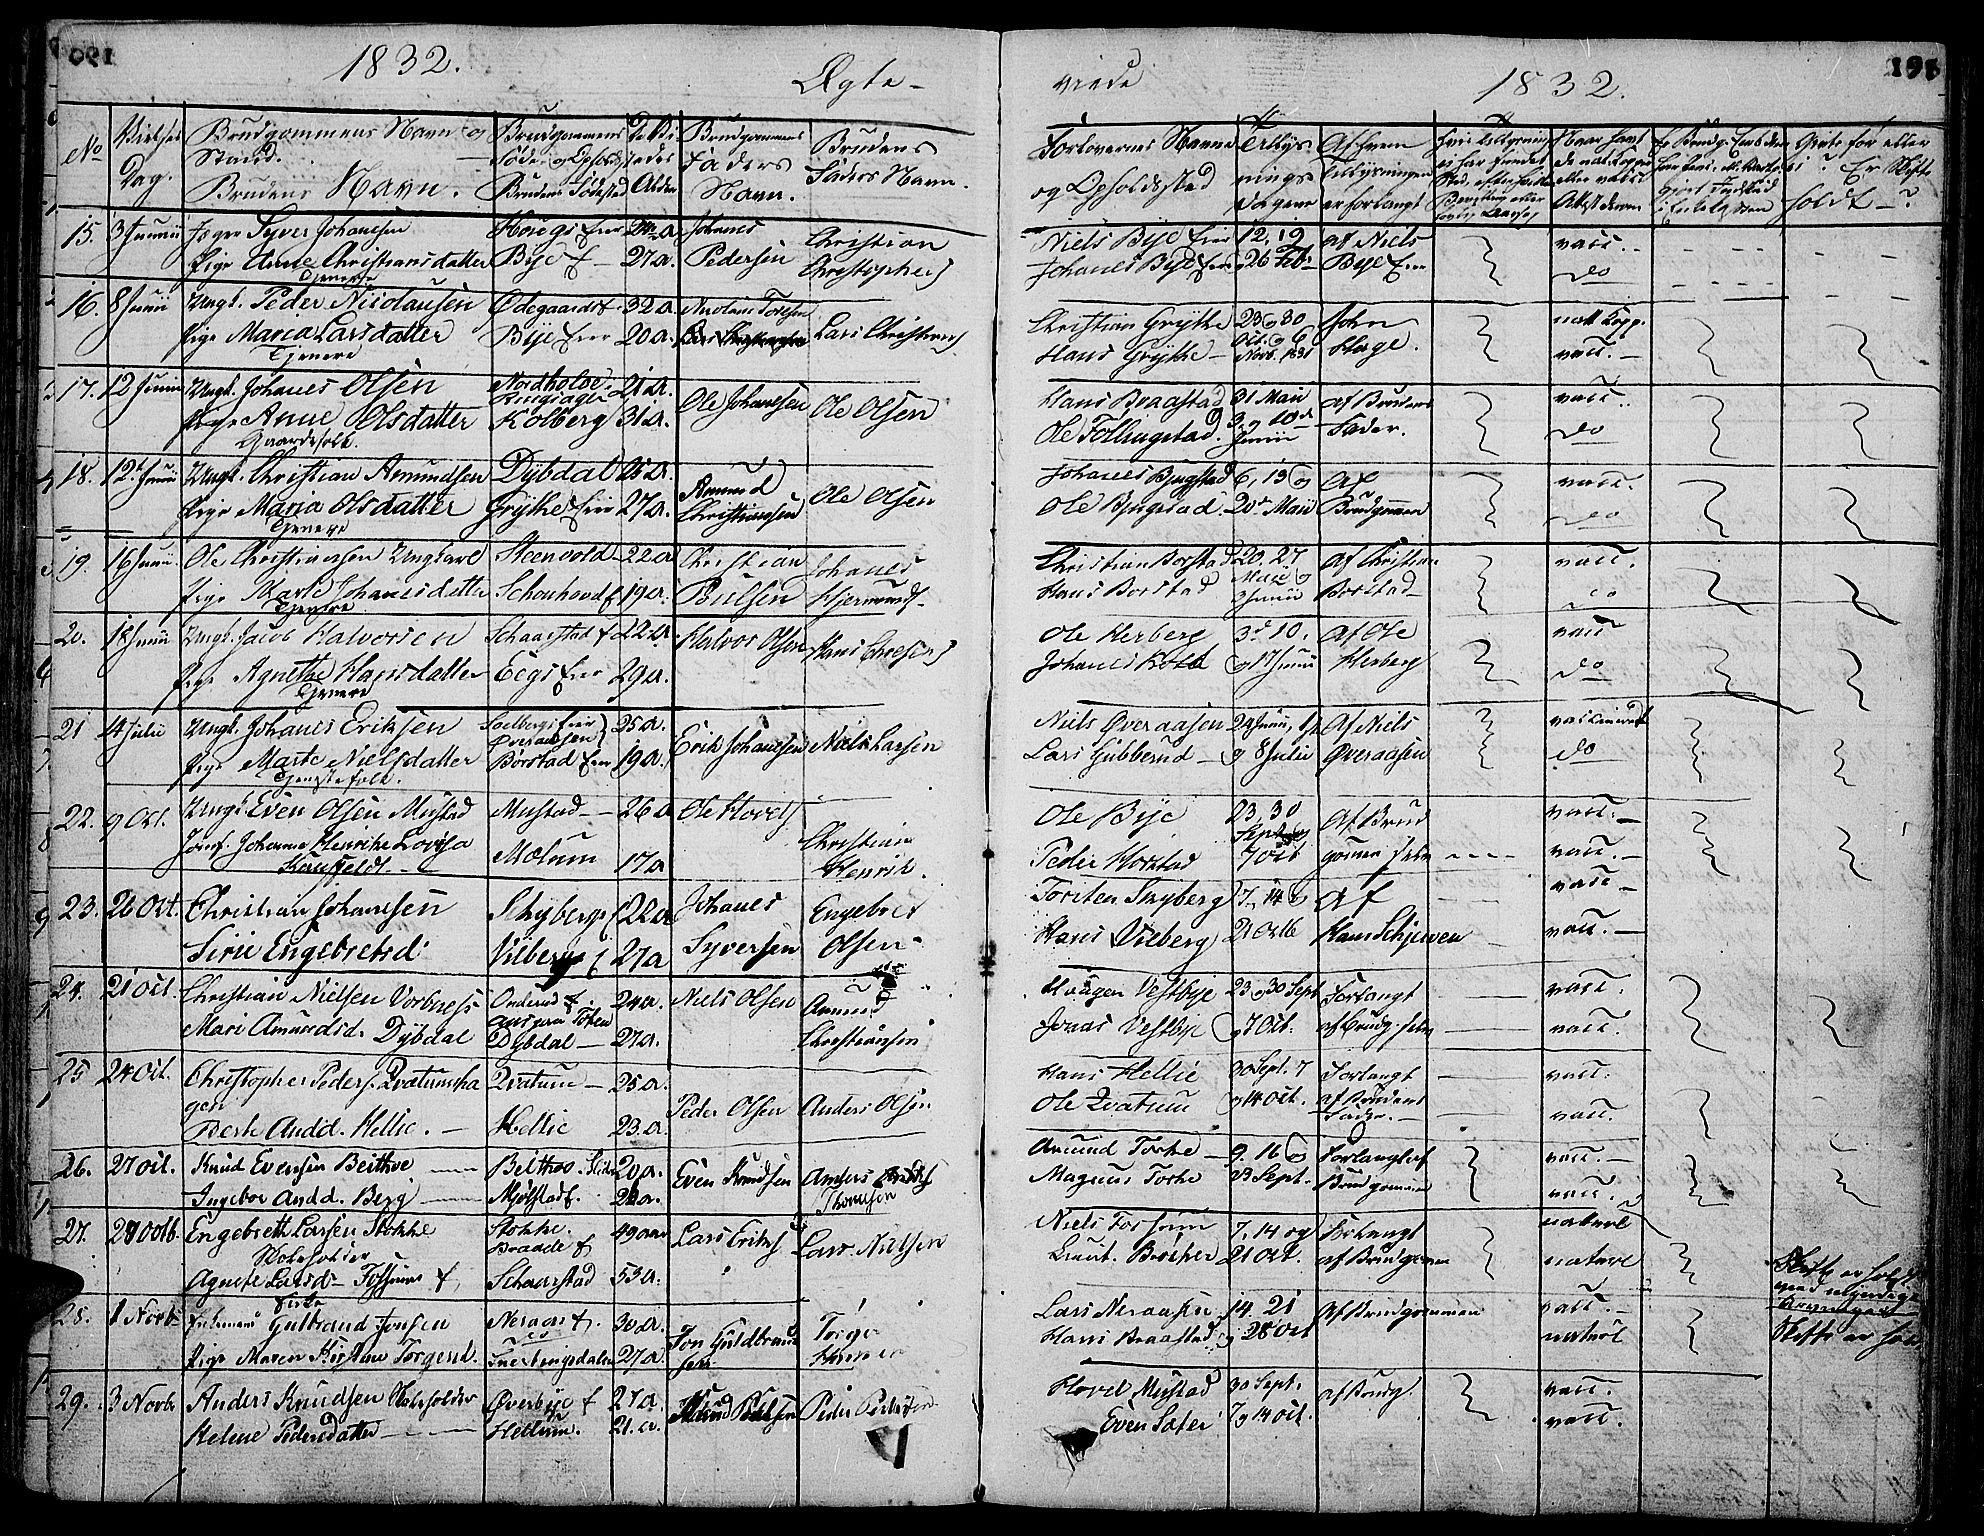 SAH, Vardal prestekontor, H/Ha/Hab/L0004: Klokkerbok nr. 4, 1831-1853, s. 191